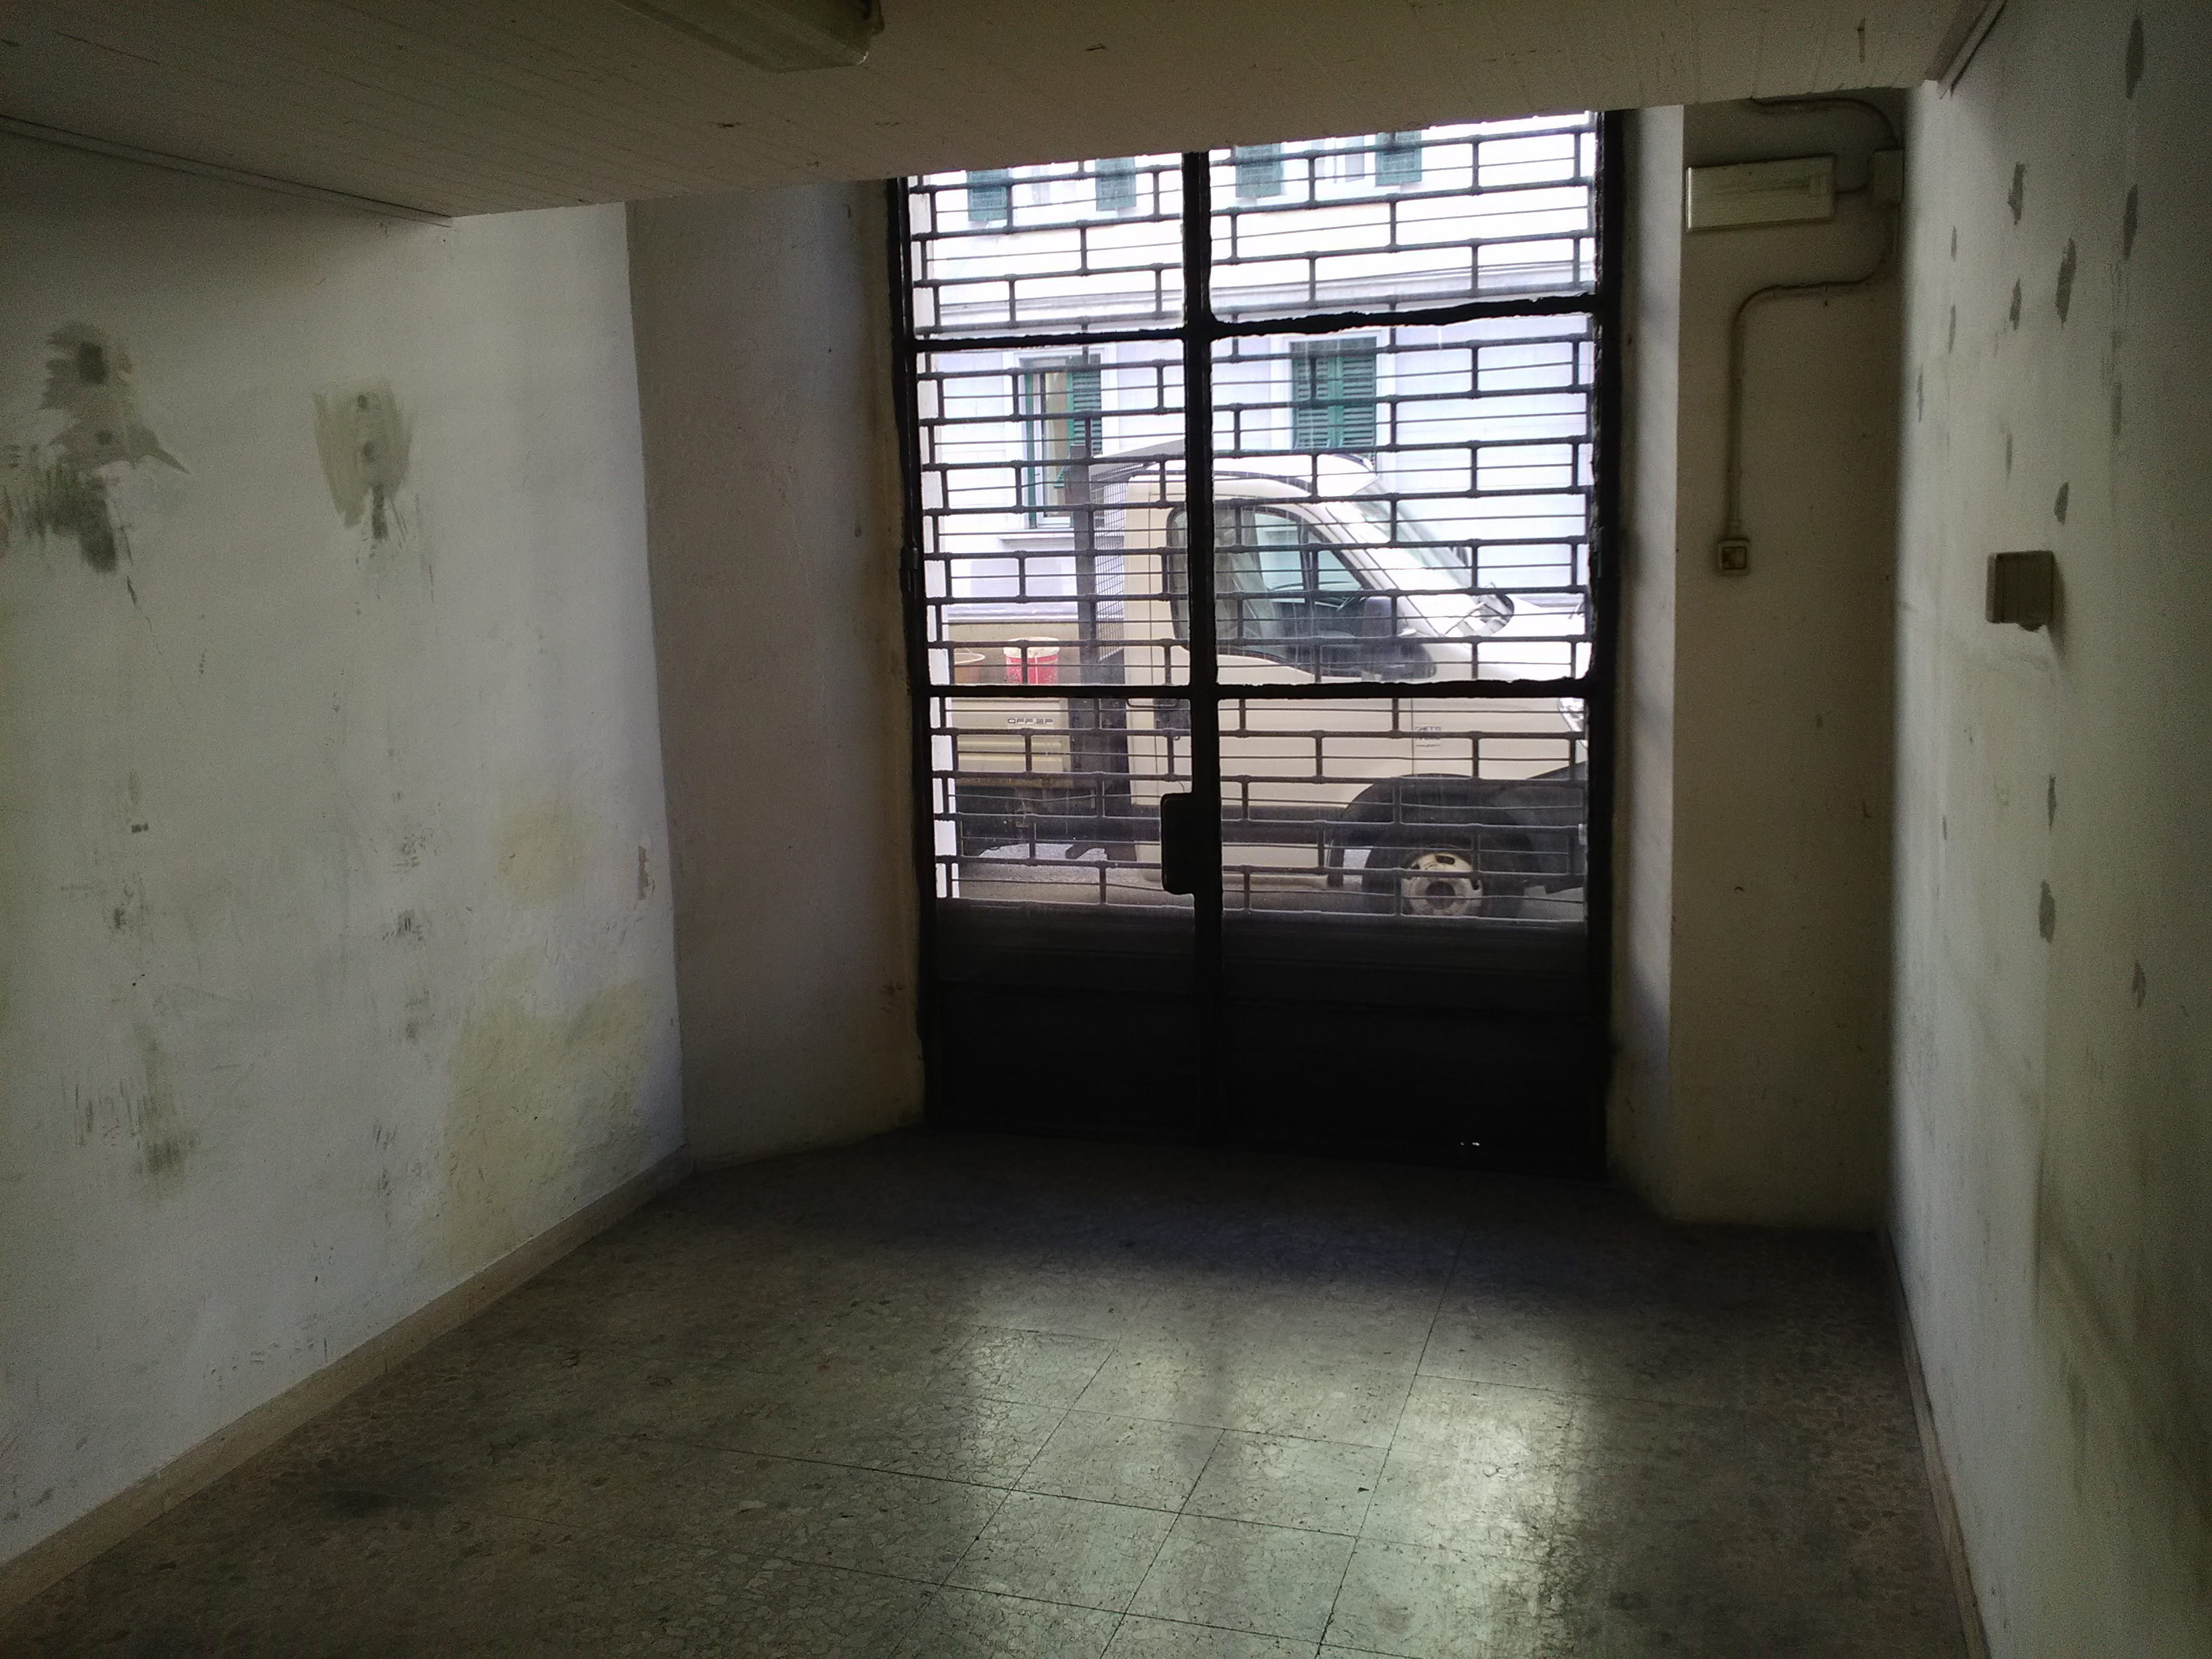 Fondo Commerciale Via Vittorio Emanuele Torriti Immobiliare